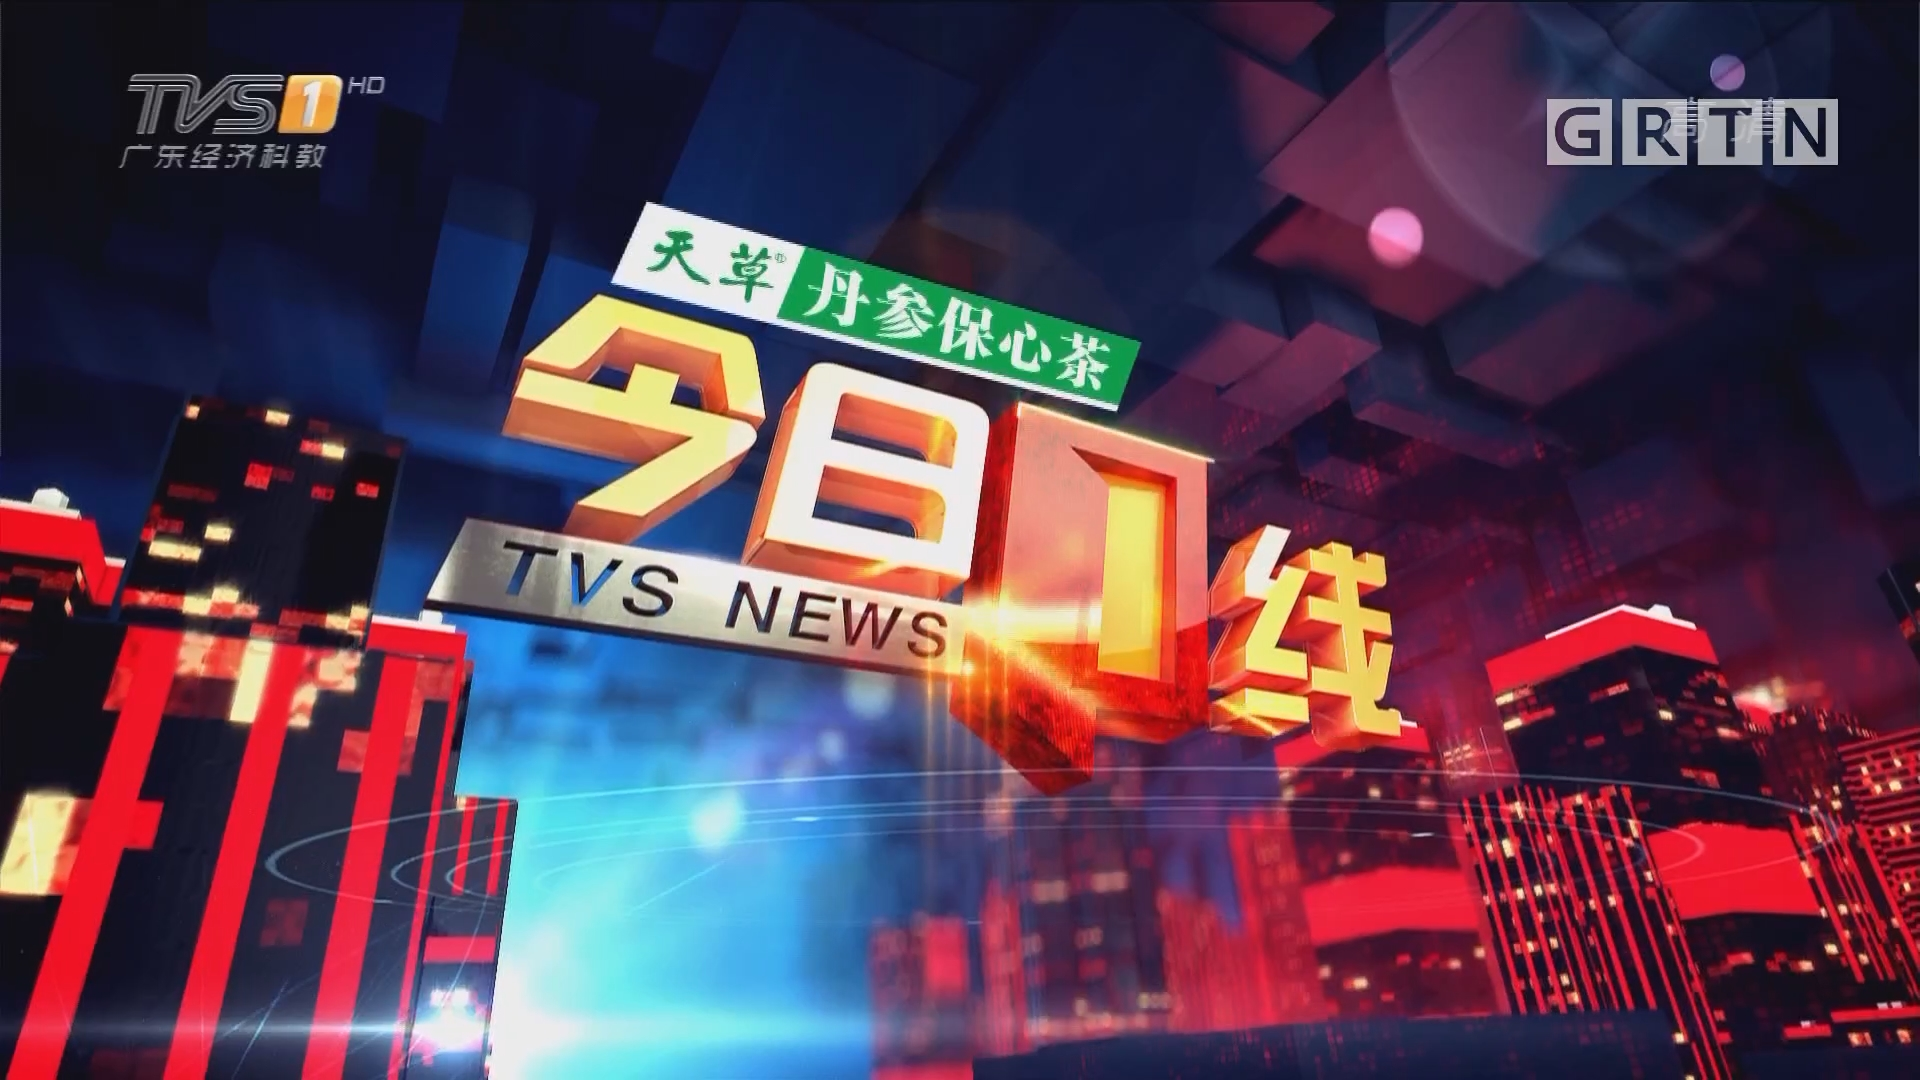 [HD][2019-03-28]今日一线:惠州惠城:学校周边弥漫异味 环保部门介入调查